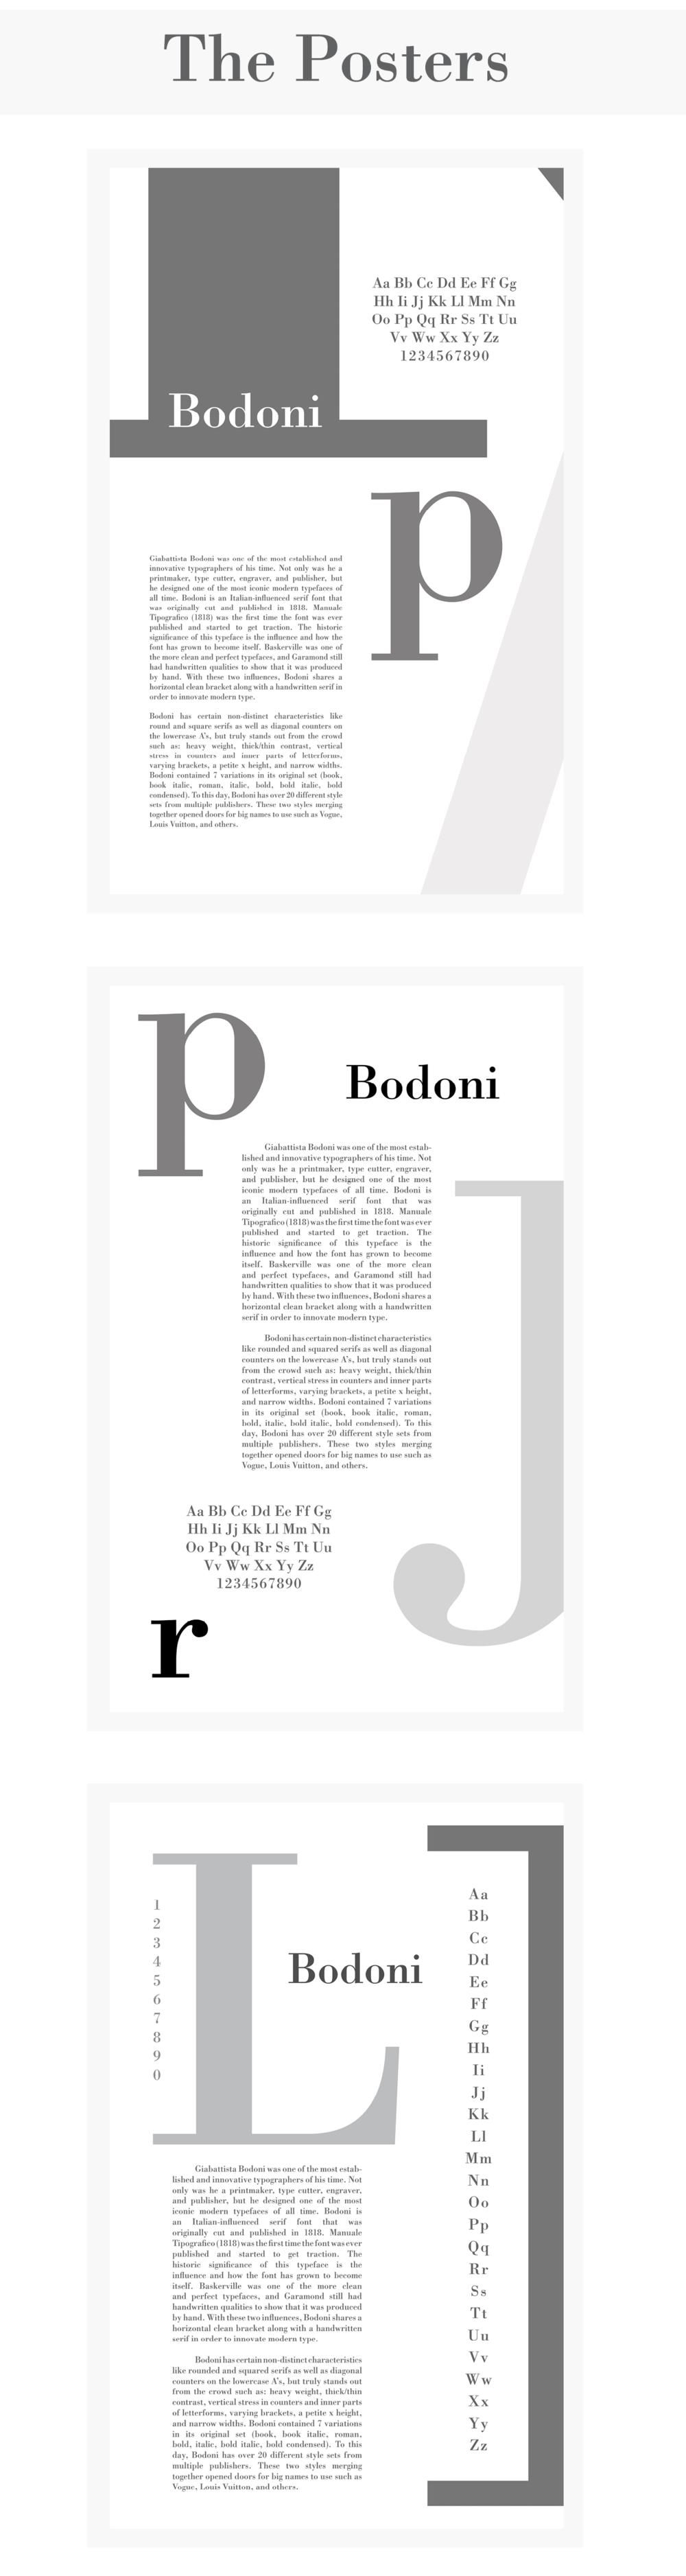 BodoniFinal copy.png